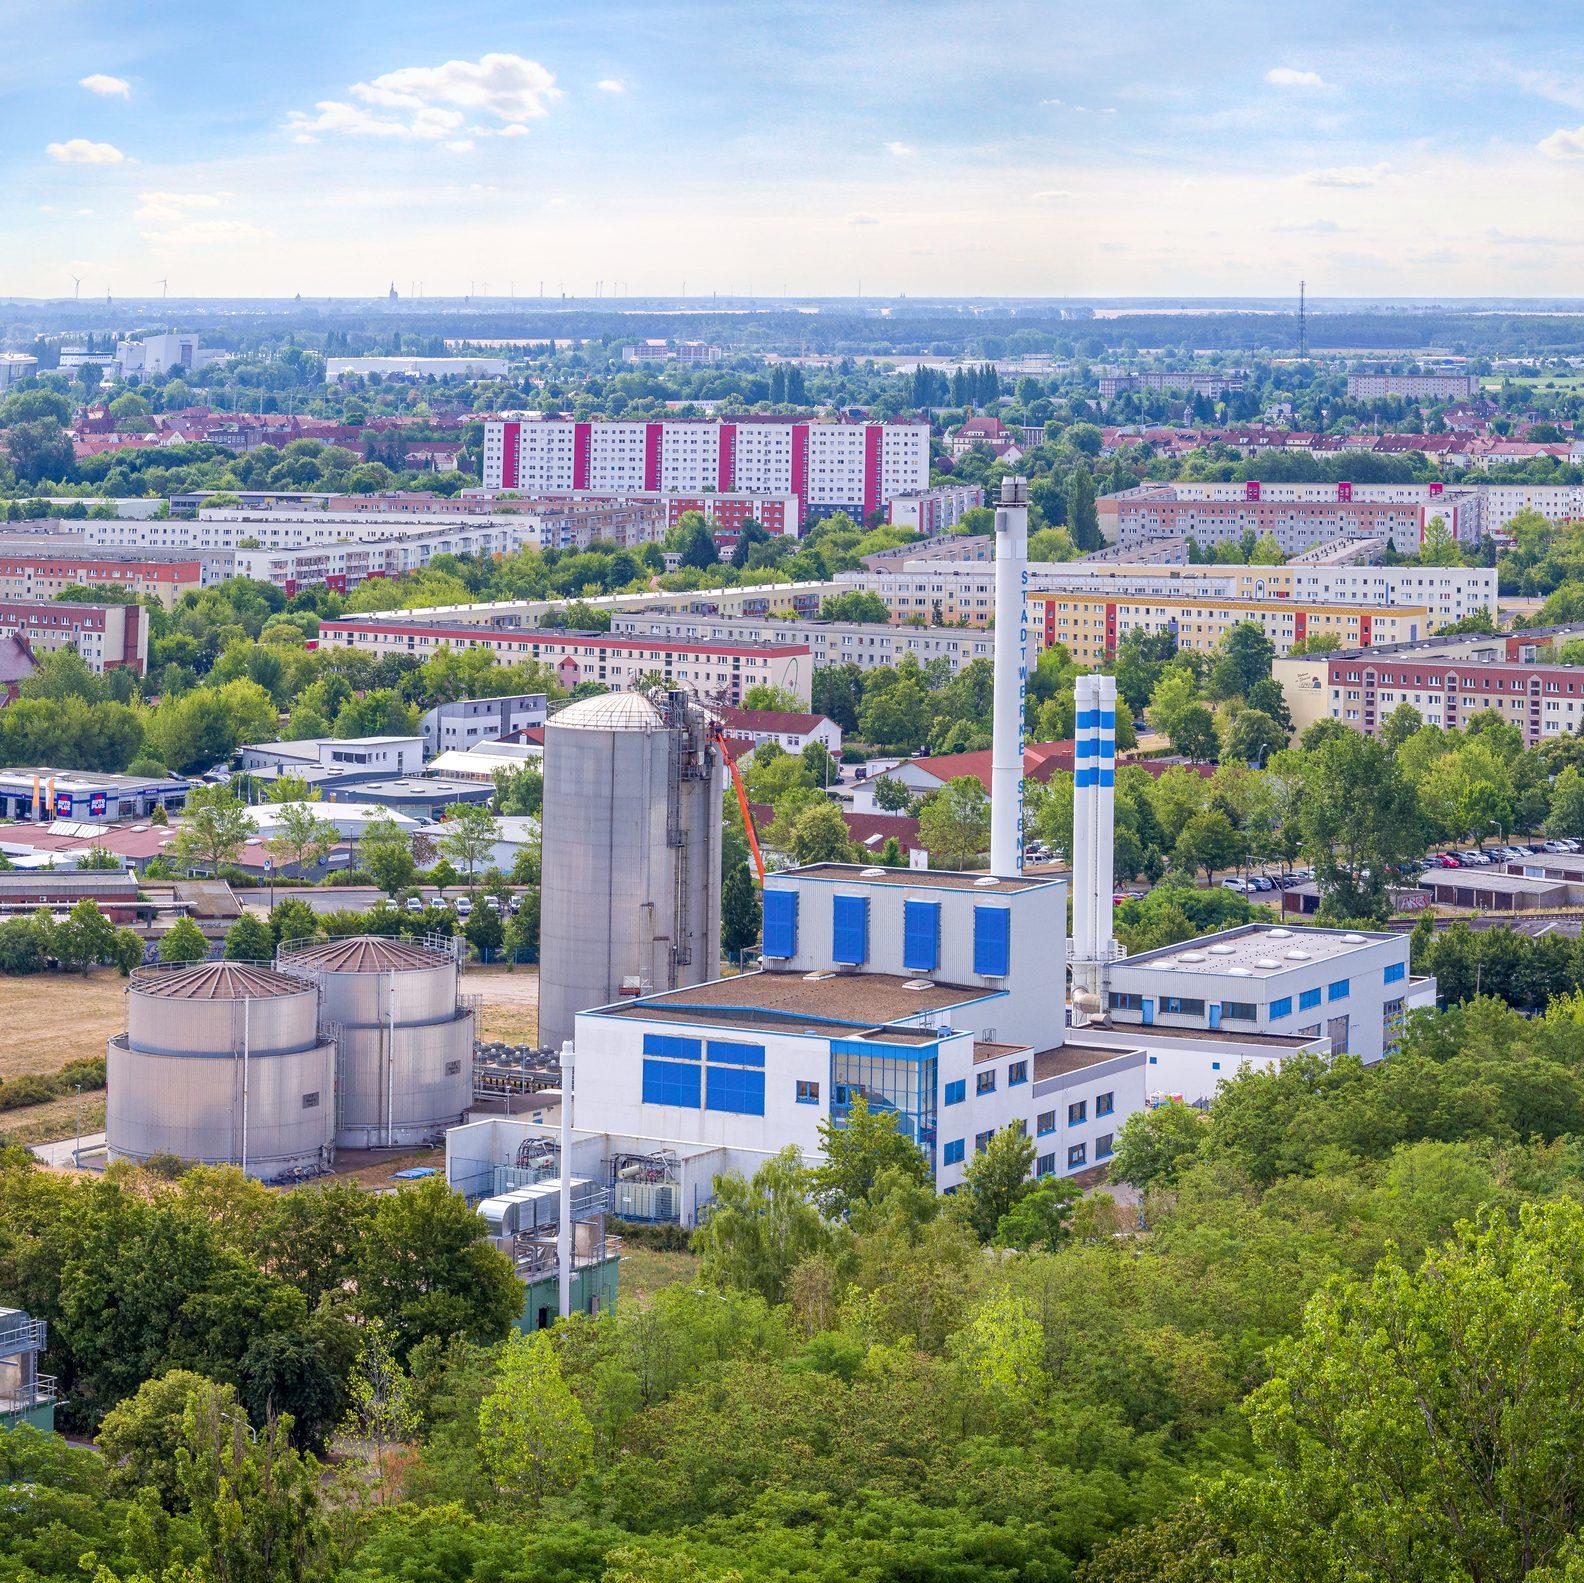 Stadtwerke Stendal